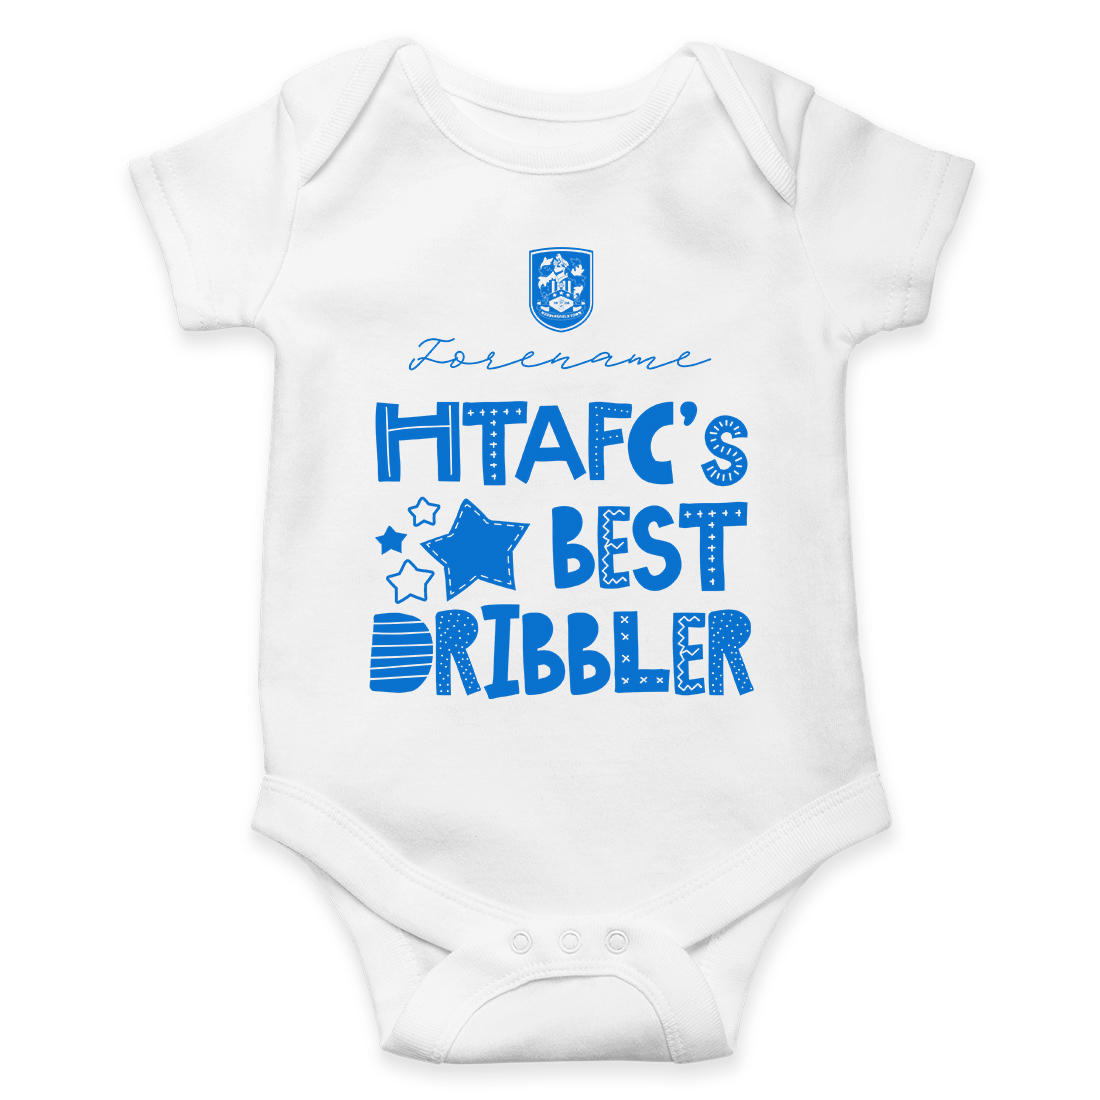 Huddersfield Town AFC Best Dribbler Baby Bodysuit